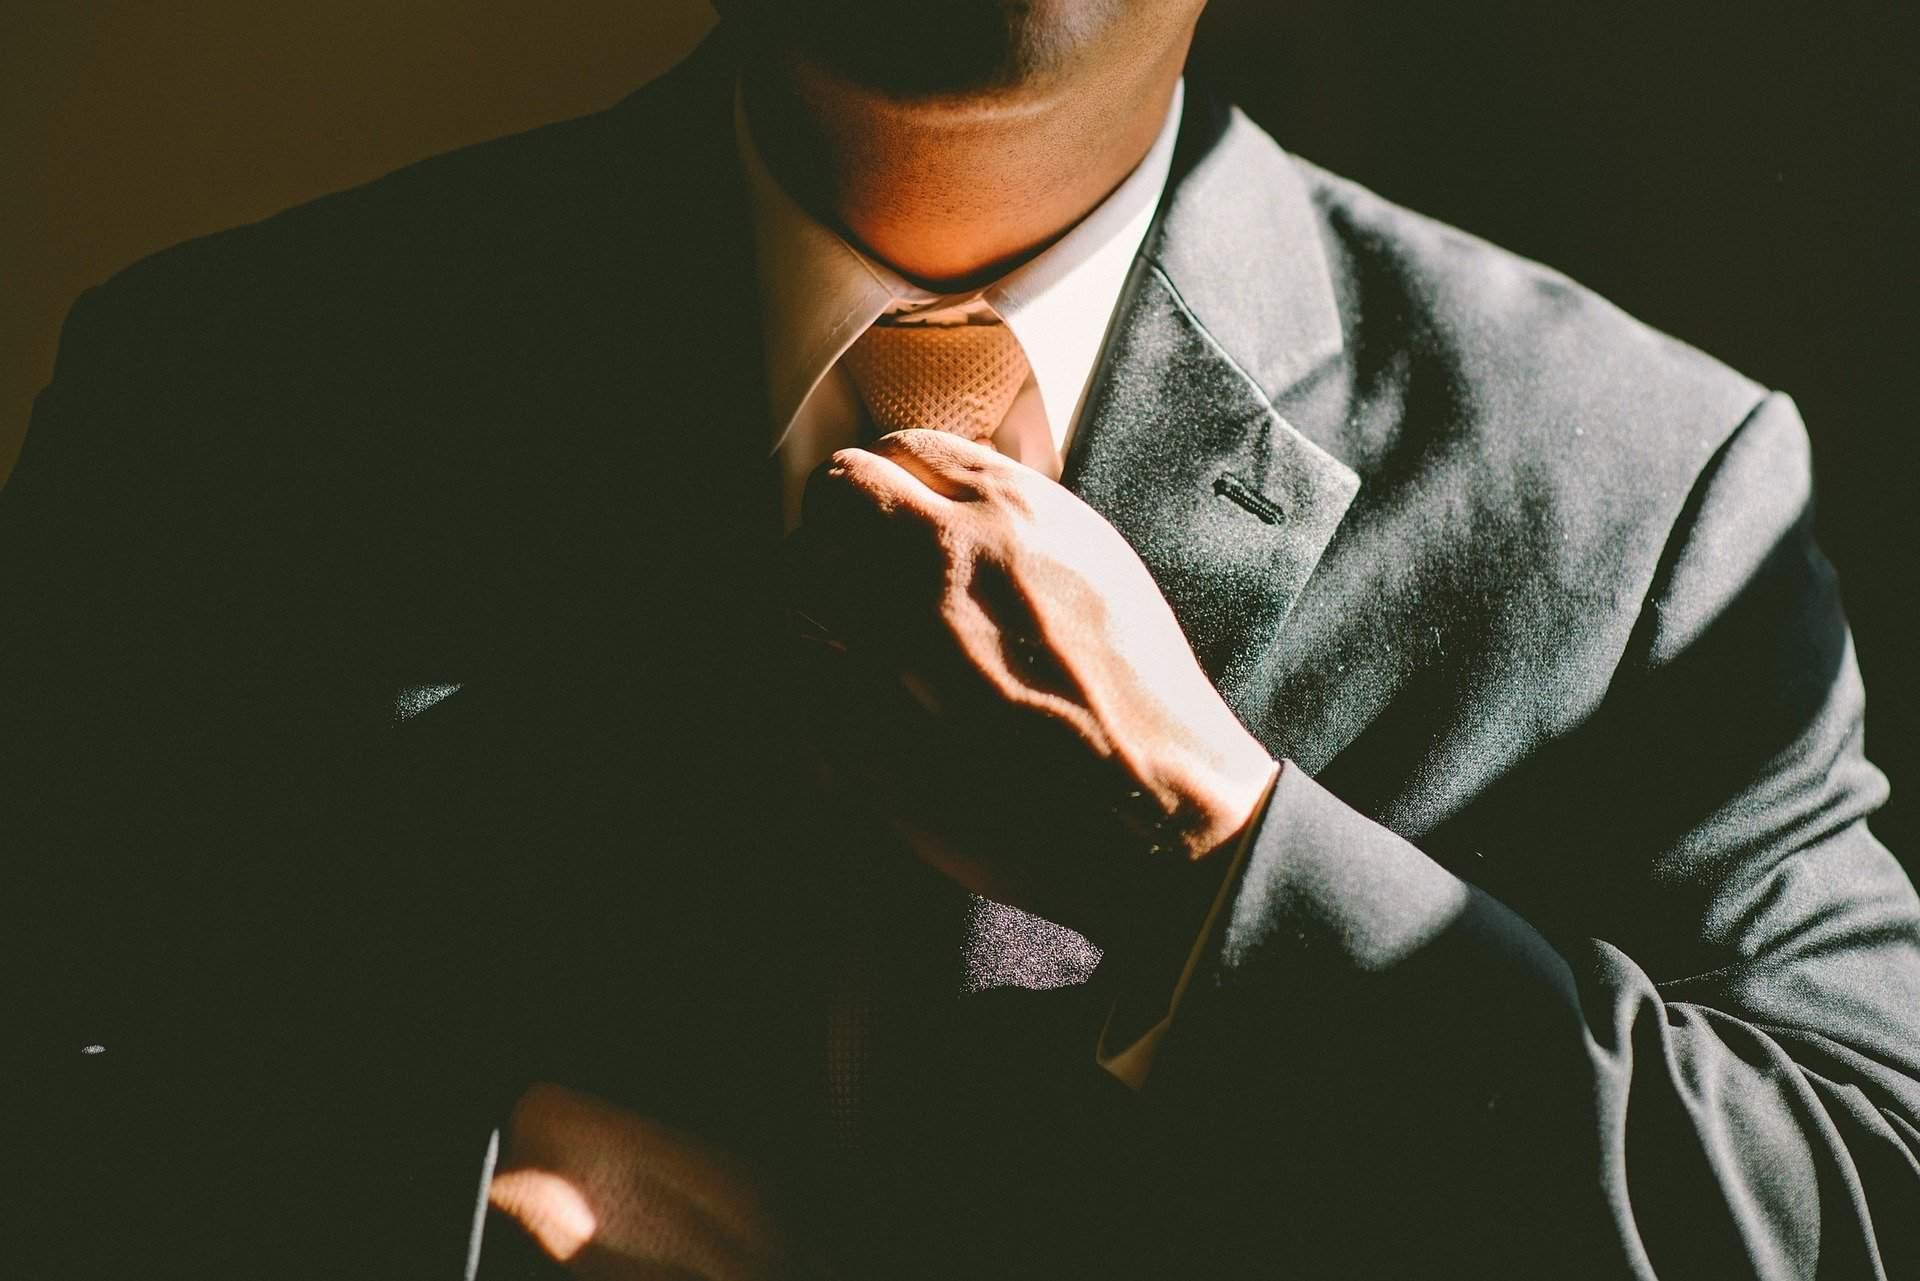 Caela se adhiere al Pacto Mundial de empresas socialmente responsables